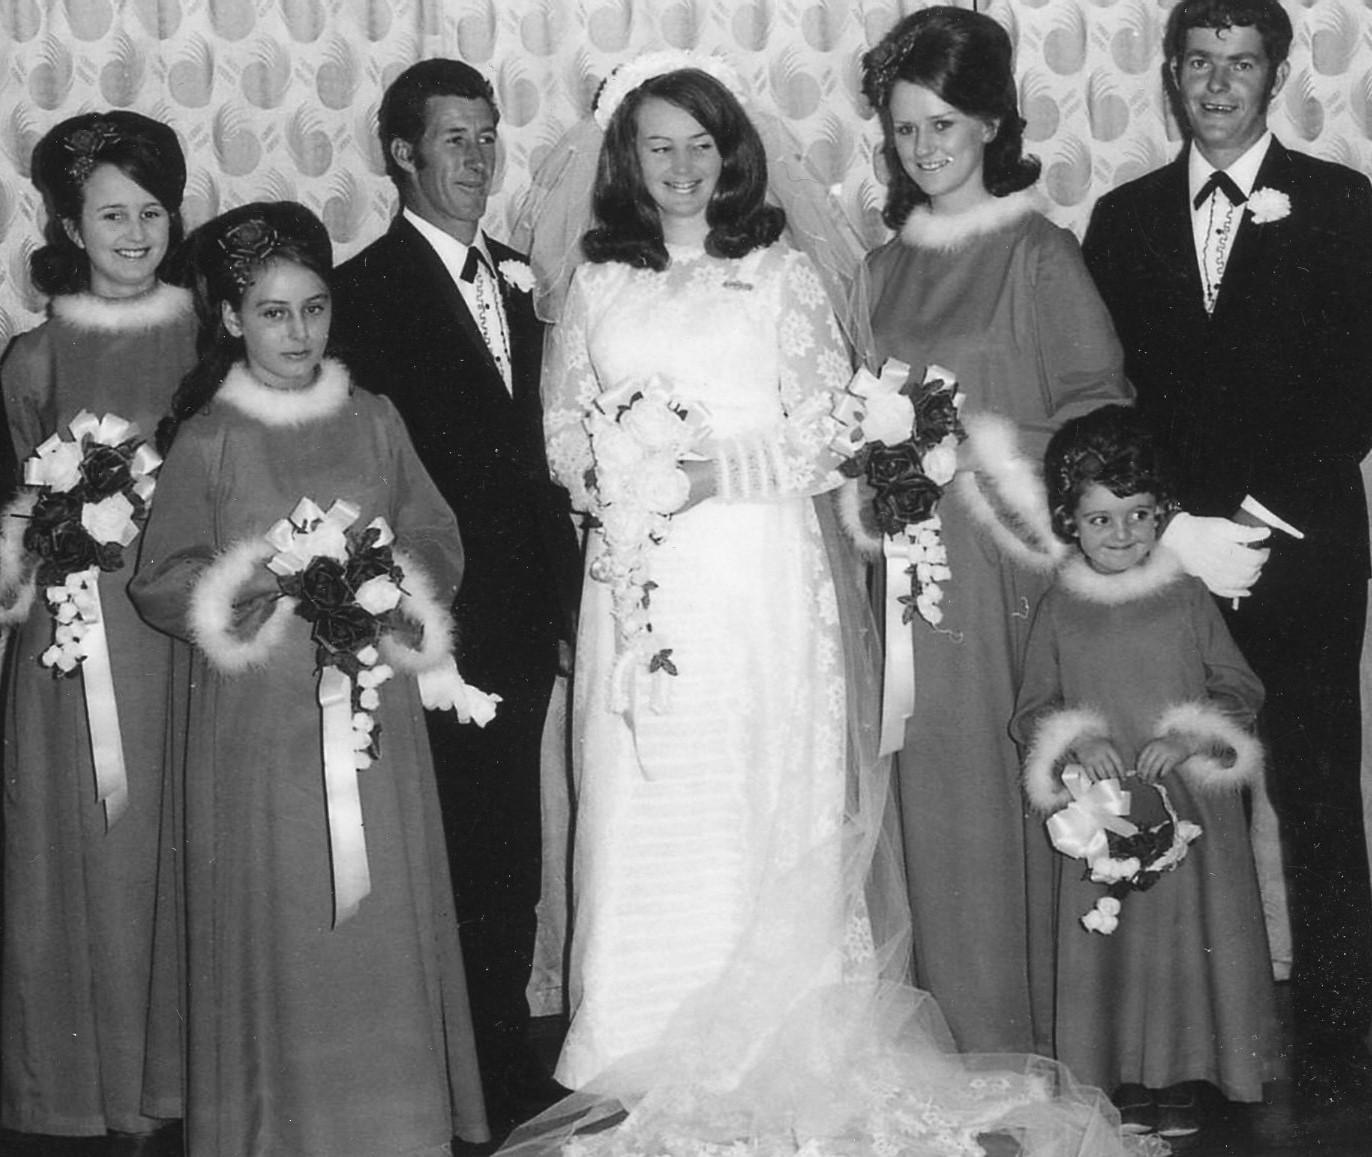 Cheryl Richardson, Debbie Burr, Garry and Diane Burr, Dell Tink, Kevin Ford and flower girl Carolyn Slattery.